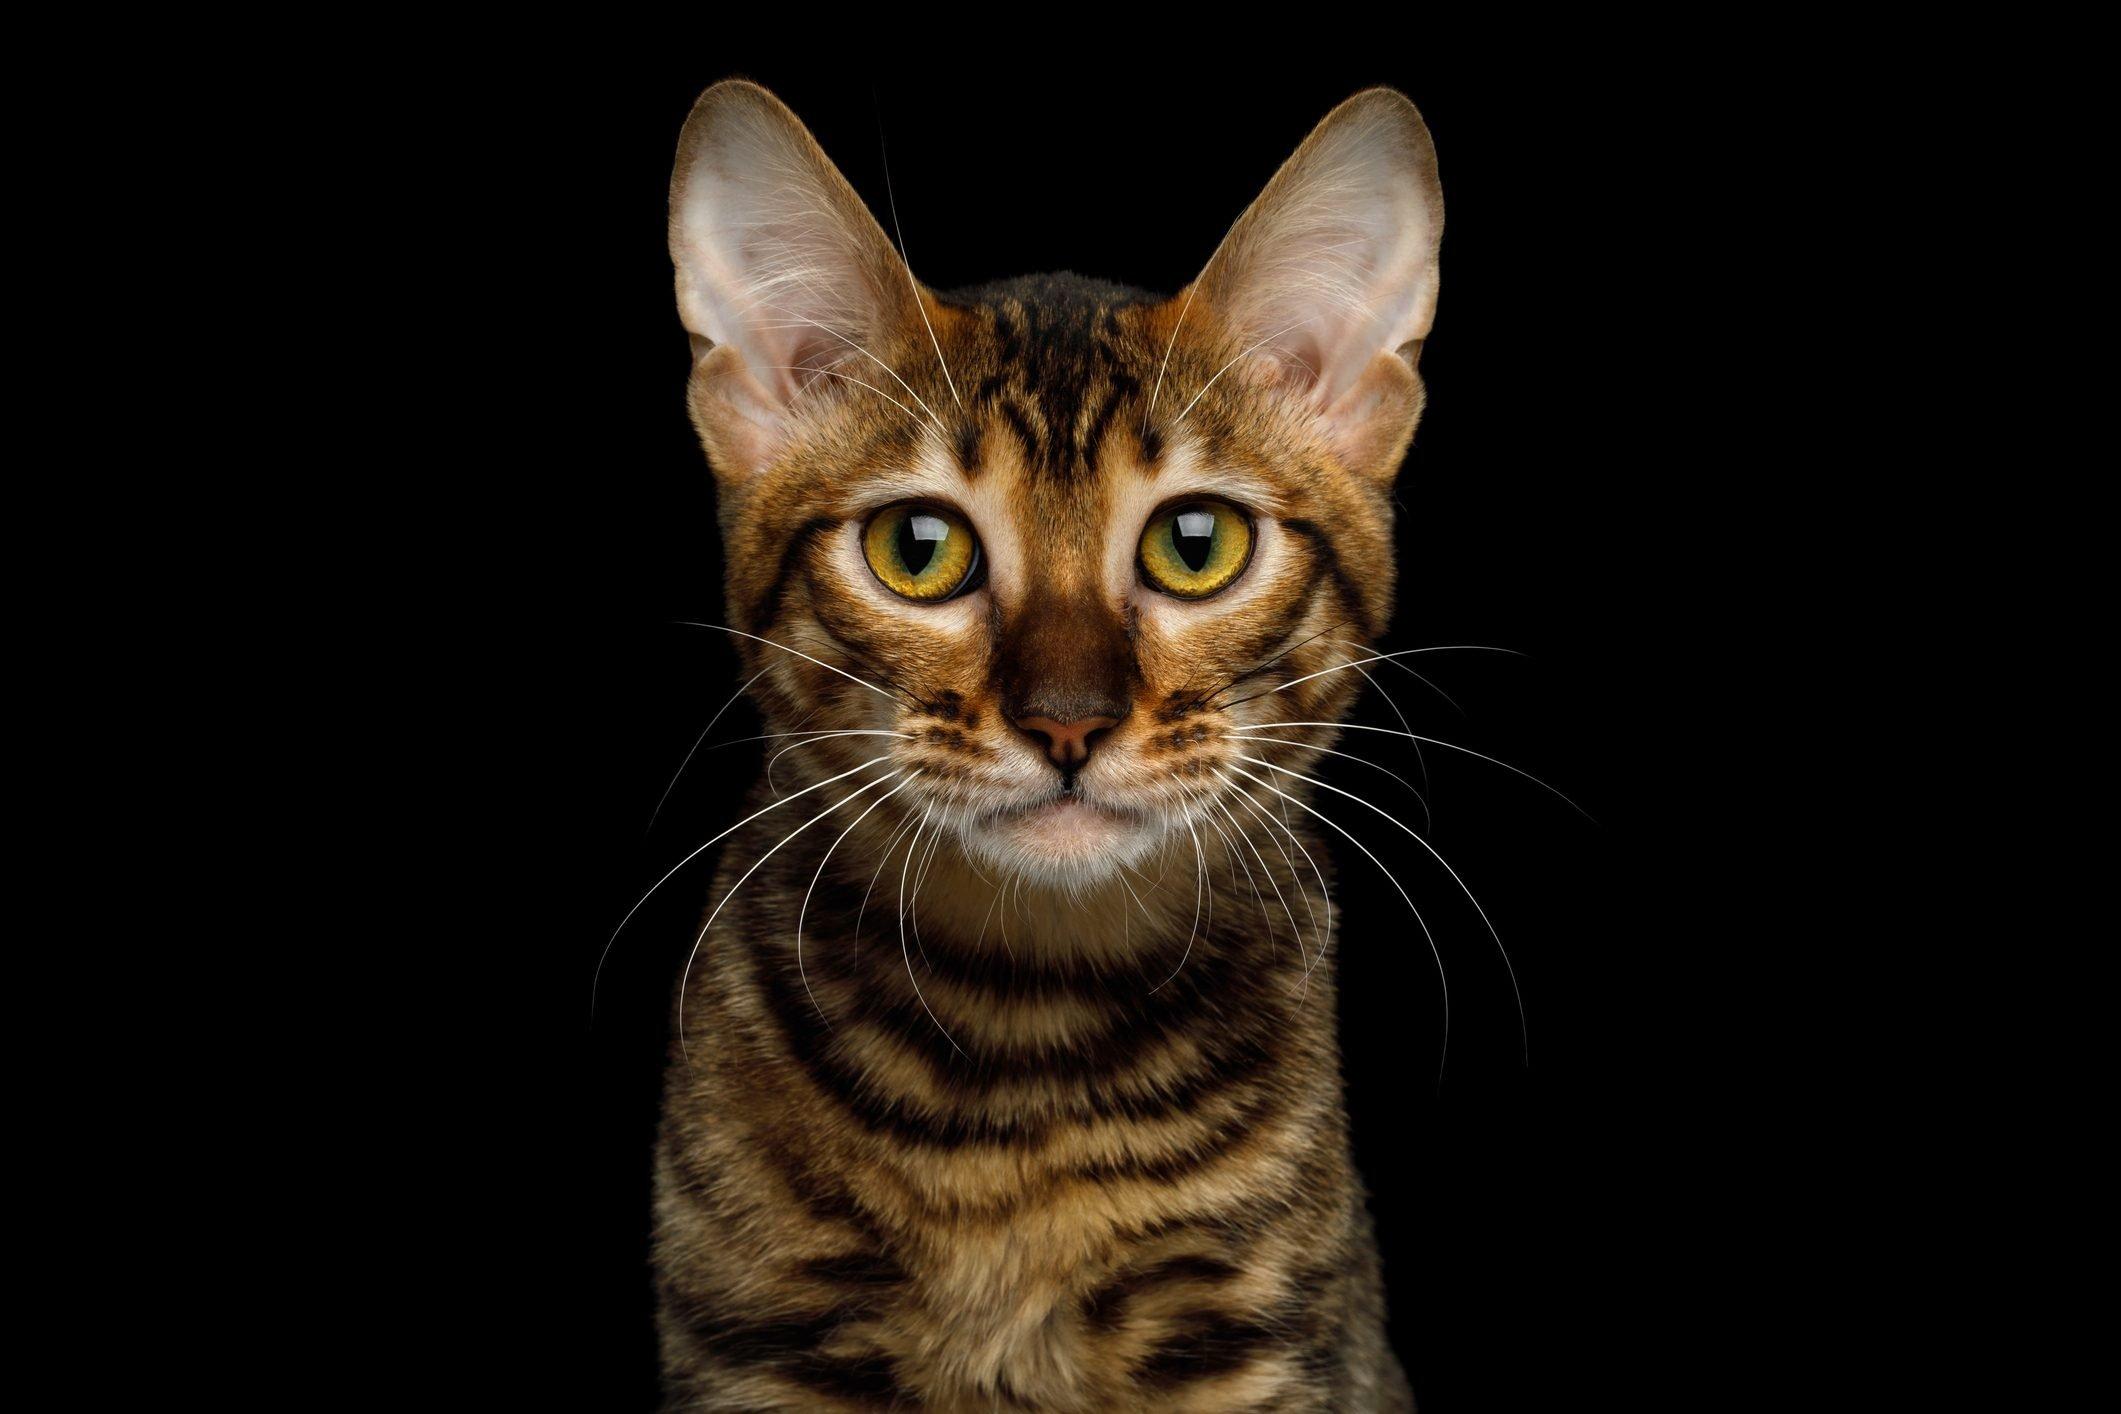 Toyger Cat on isolated Black Background